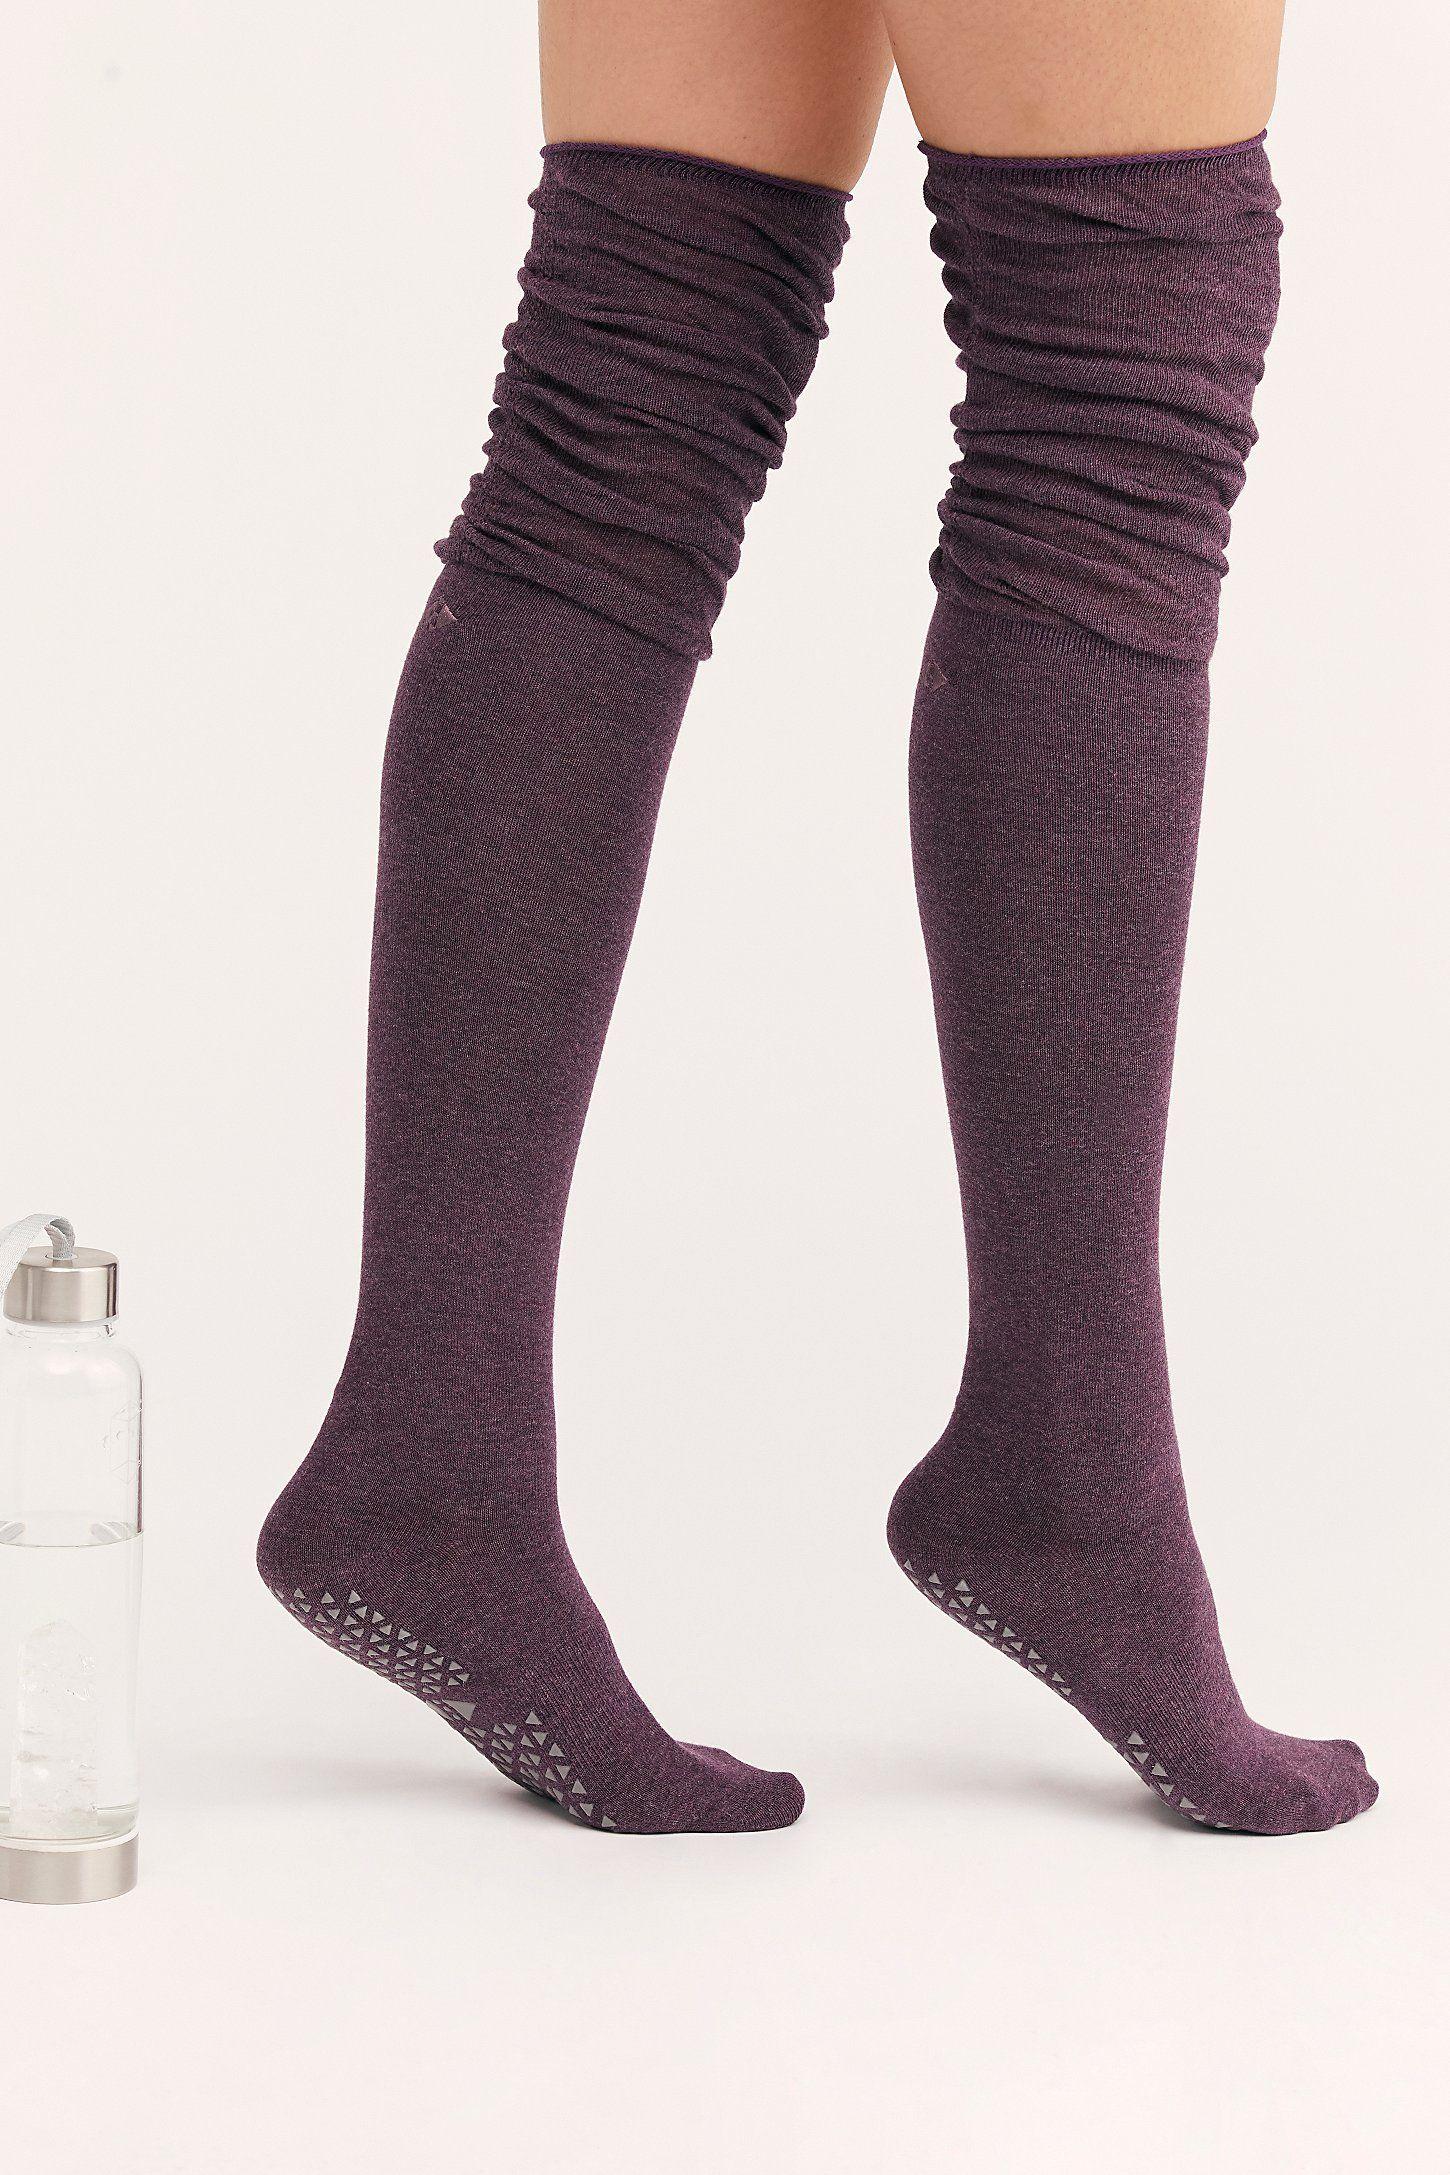 Cotton Blend Toeless Ribbed Over the Knee Socks|4-9